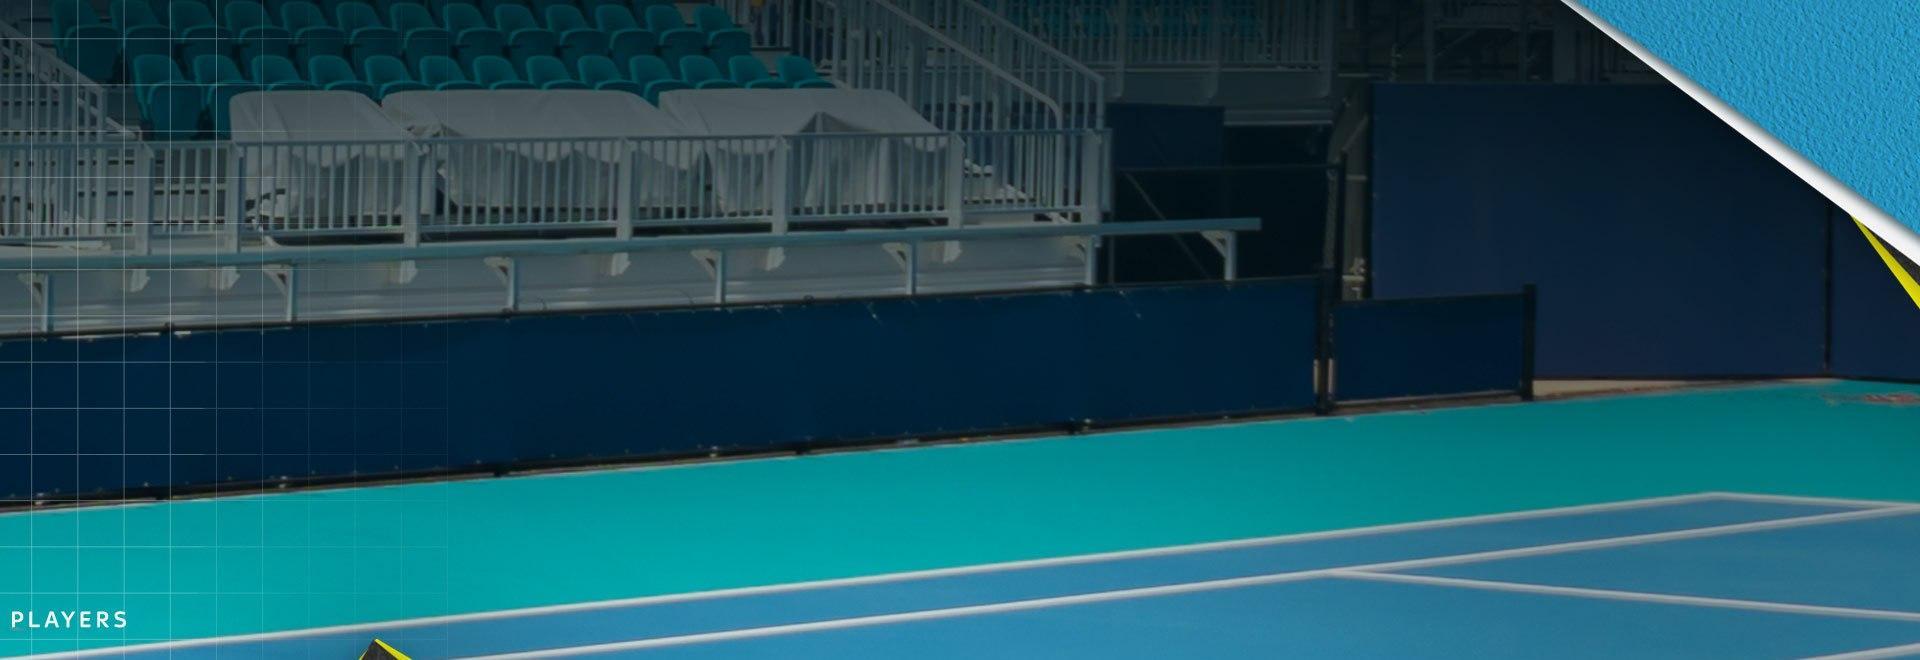 Bautista Agut - Sinner. 1a semifinale